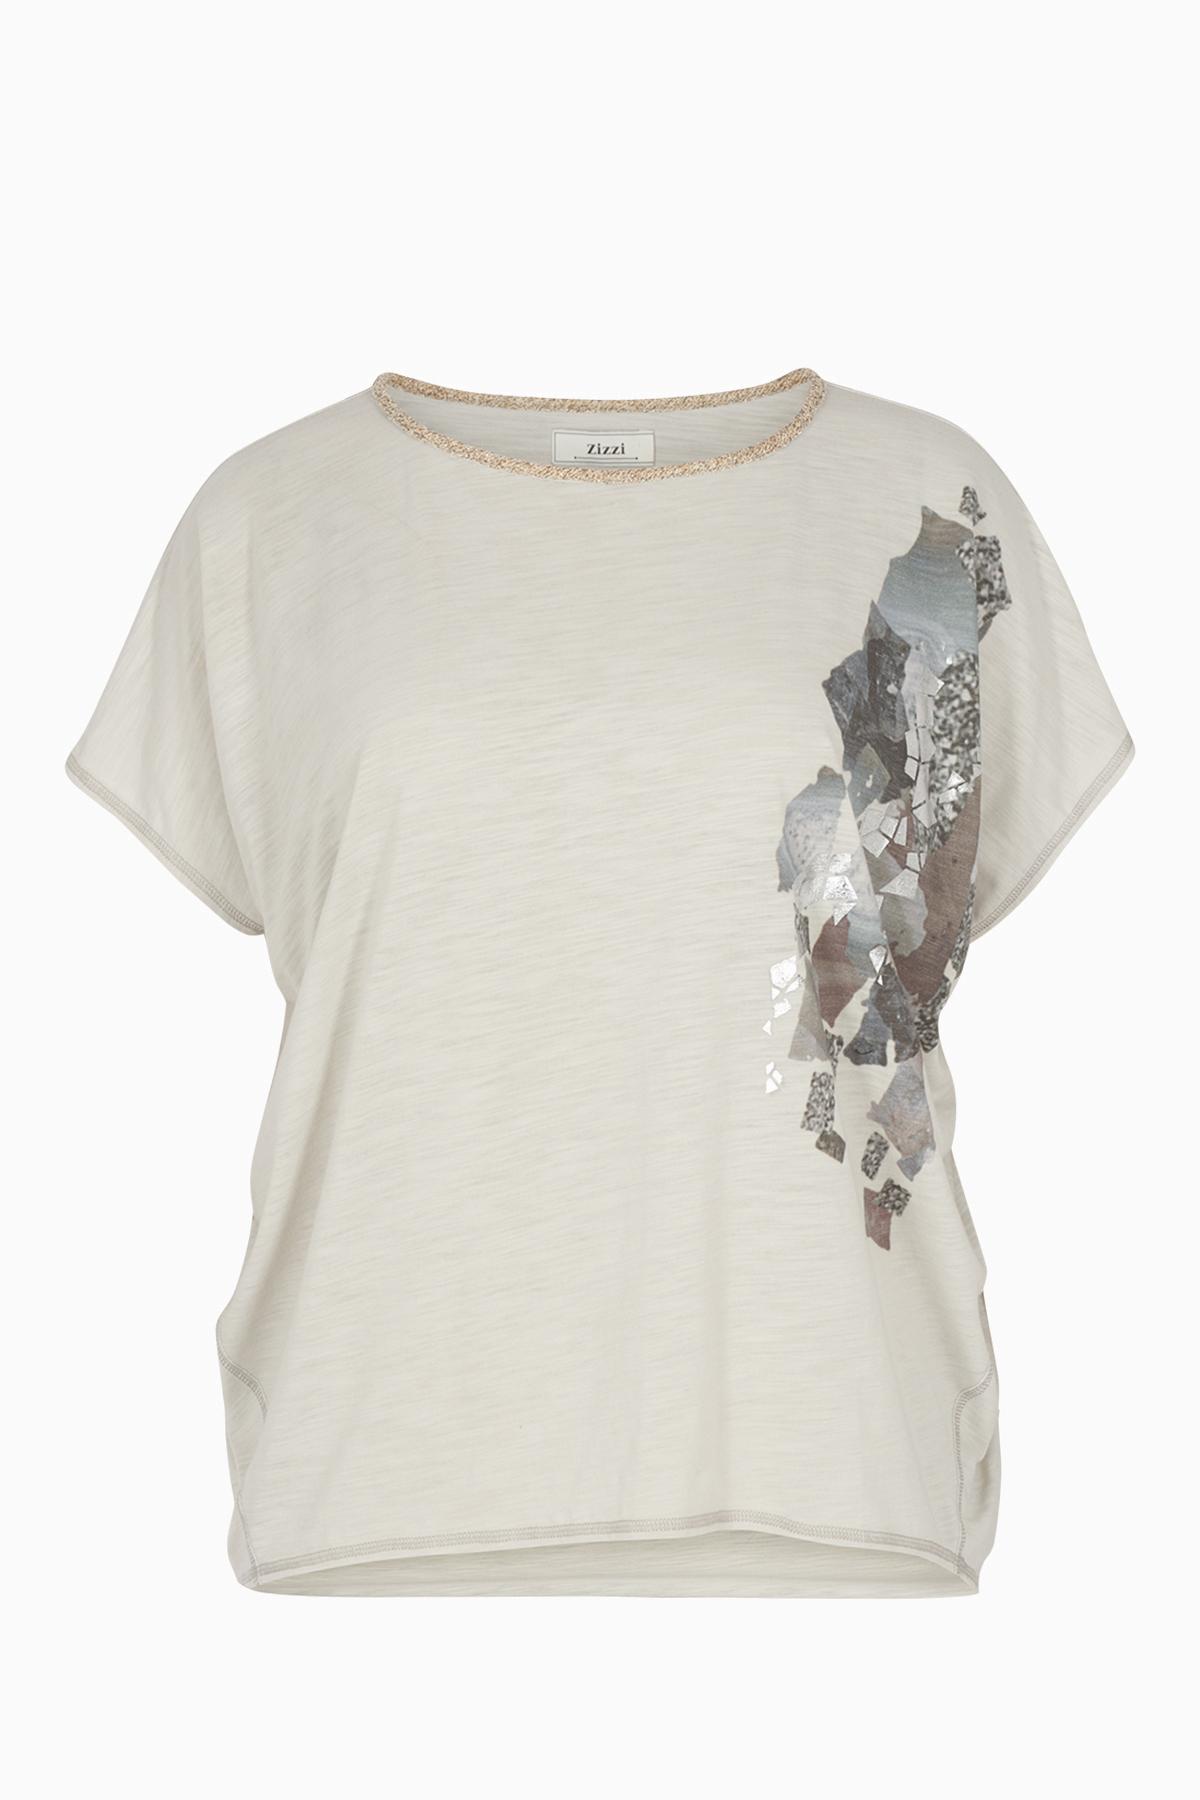 Hellgrau Kurzarm T-Shirt von Zizzi – Shoppen Sie Hellgrau Kurzarm T-Shirt ab Gr. 42-44-54-56 hier